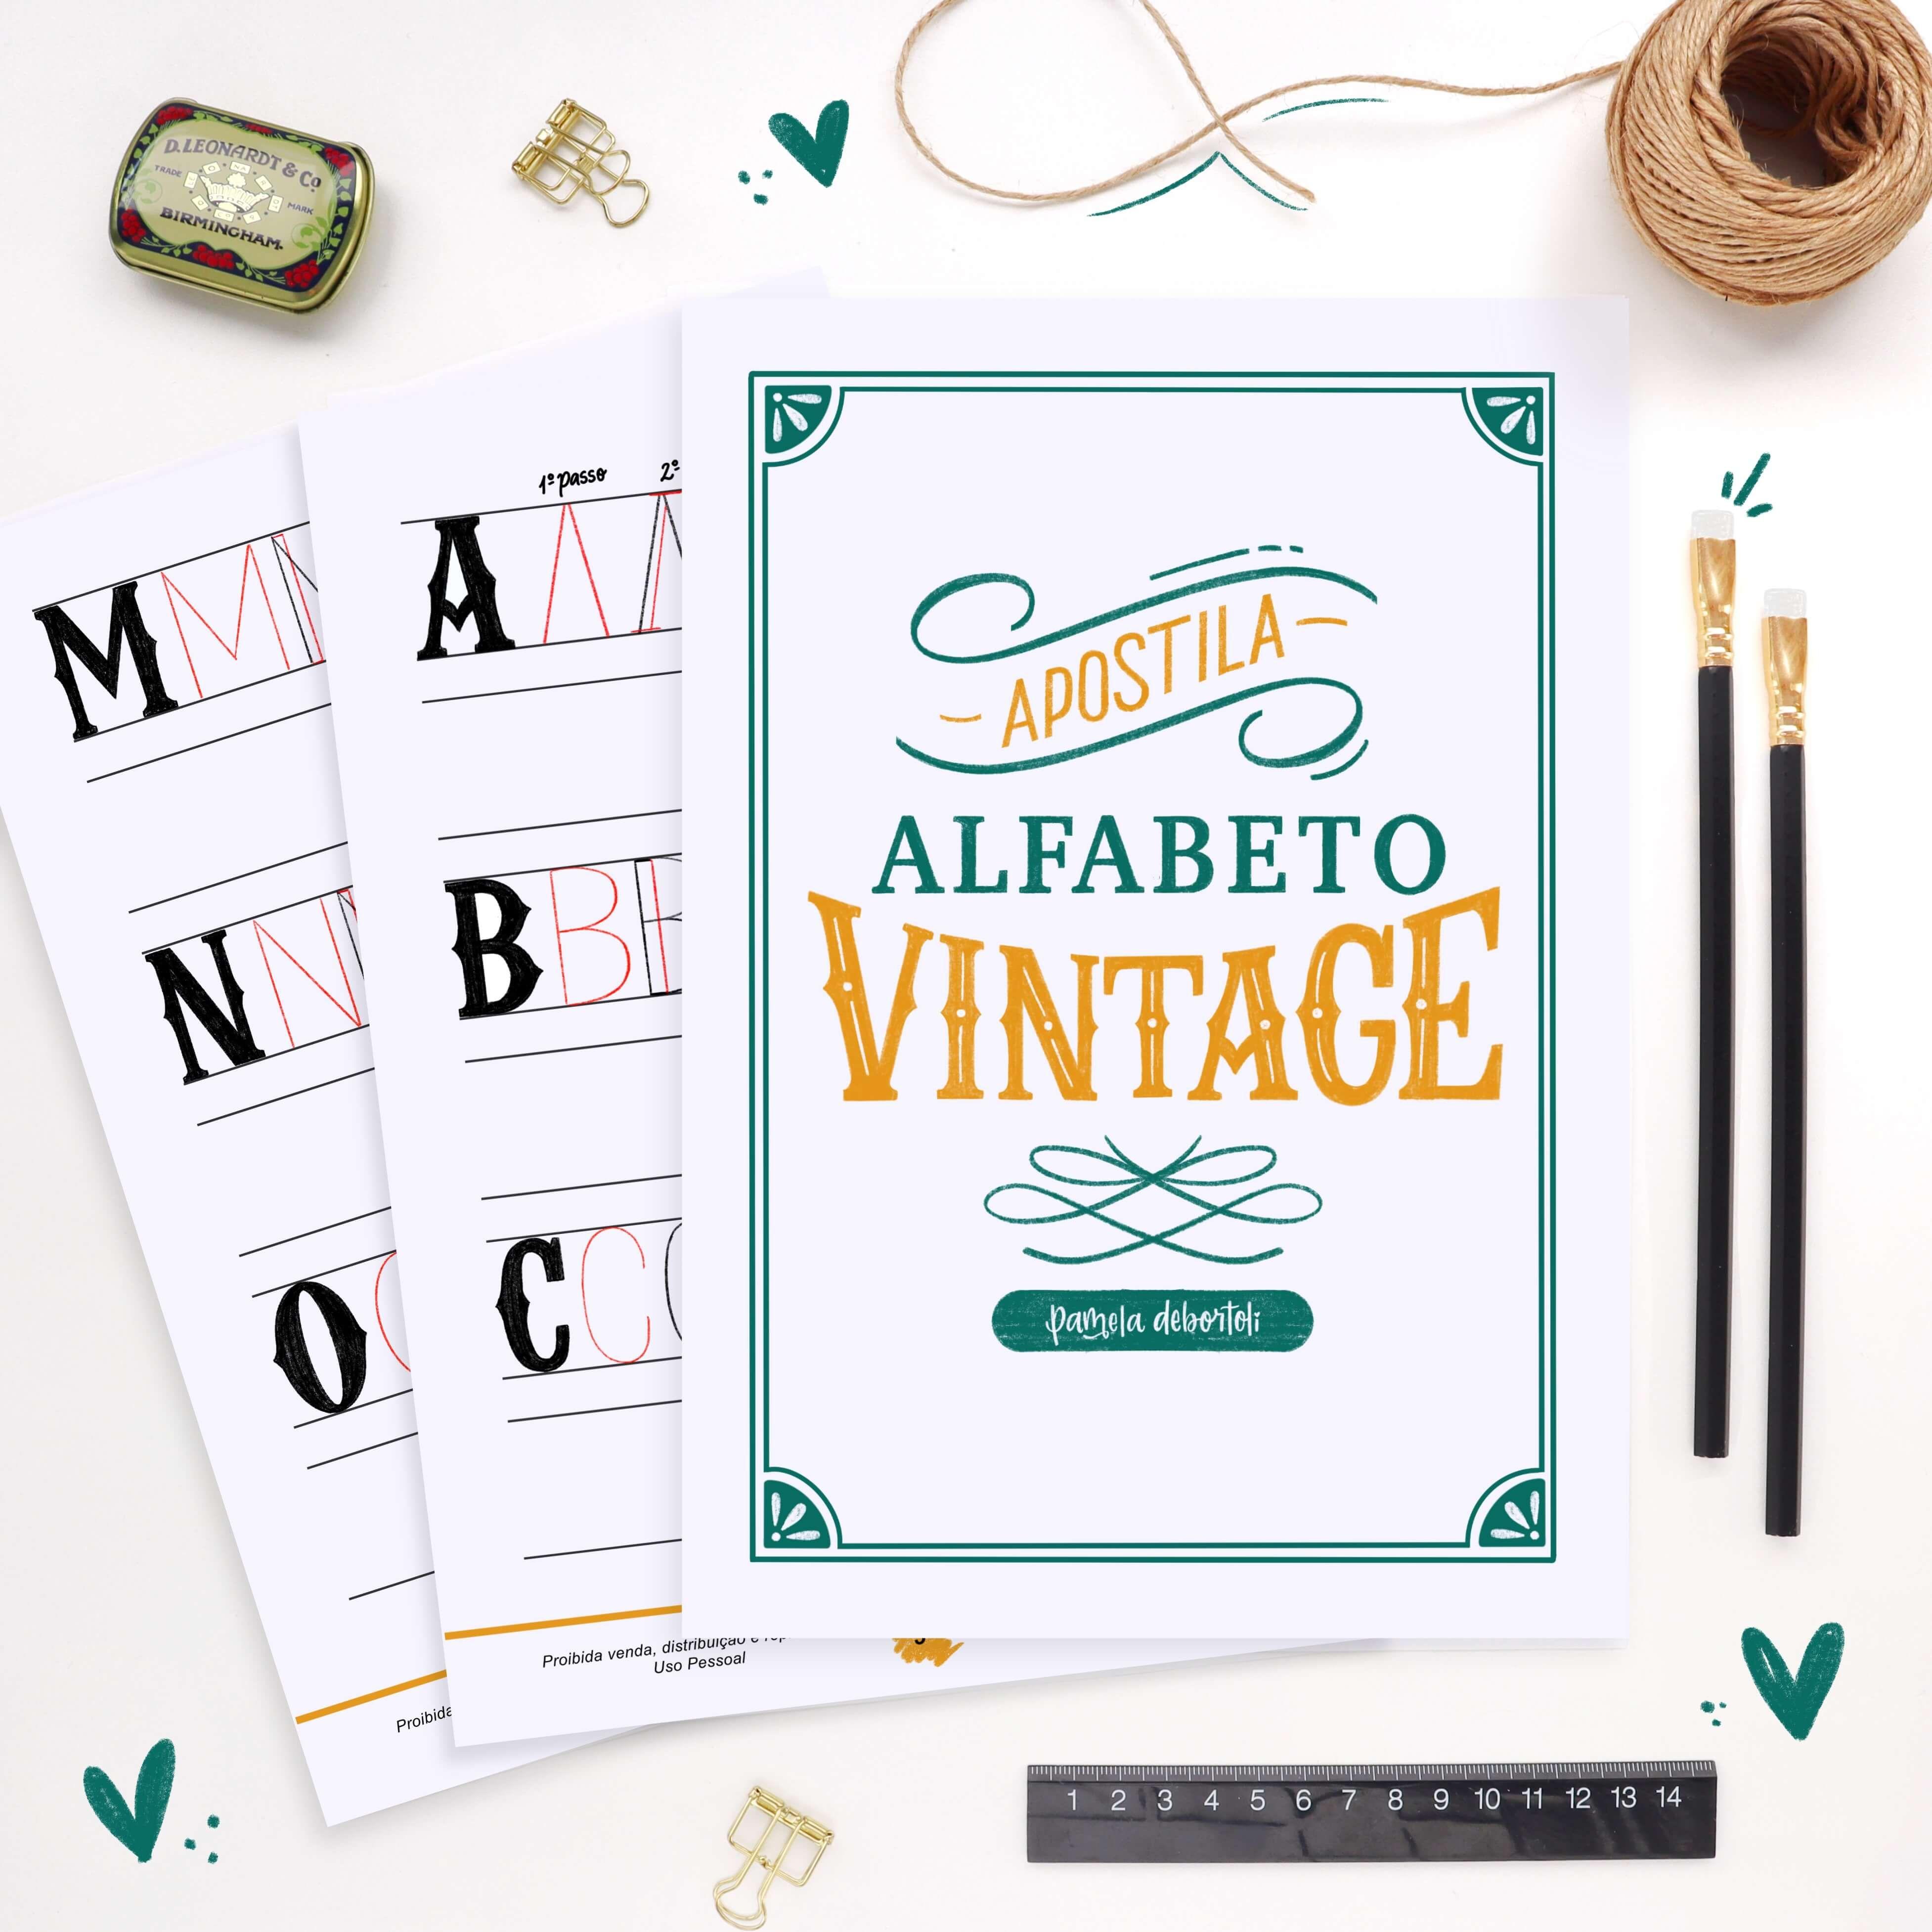 Apostila Alfabeto Vintage Completo